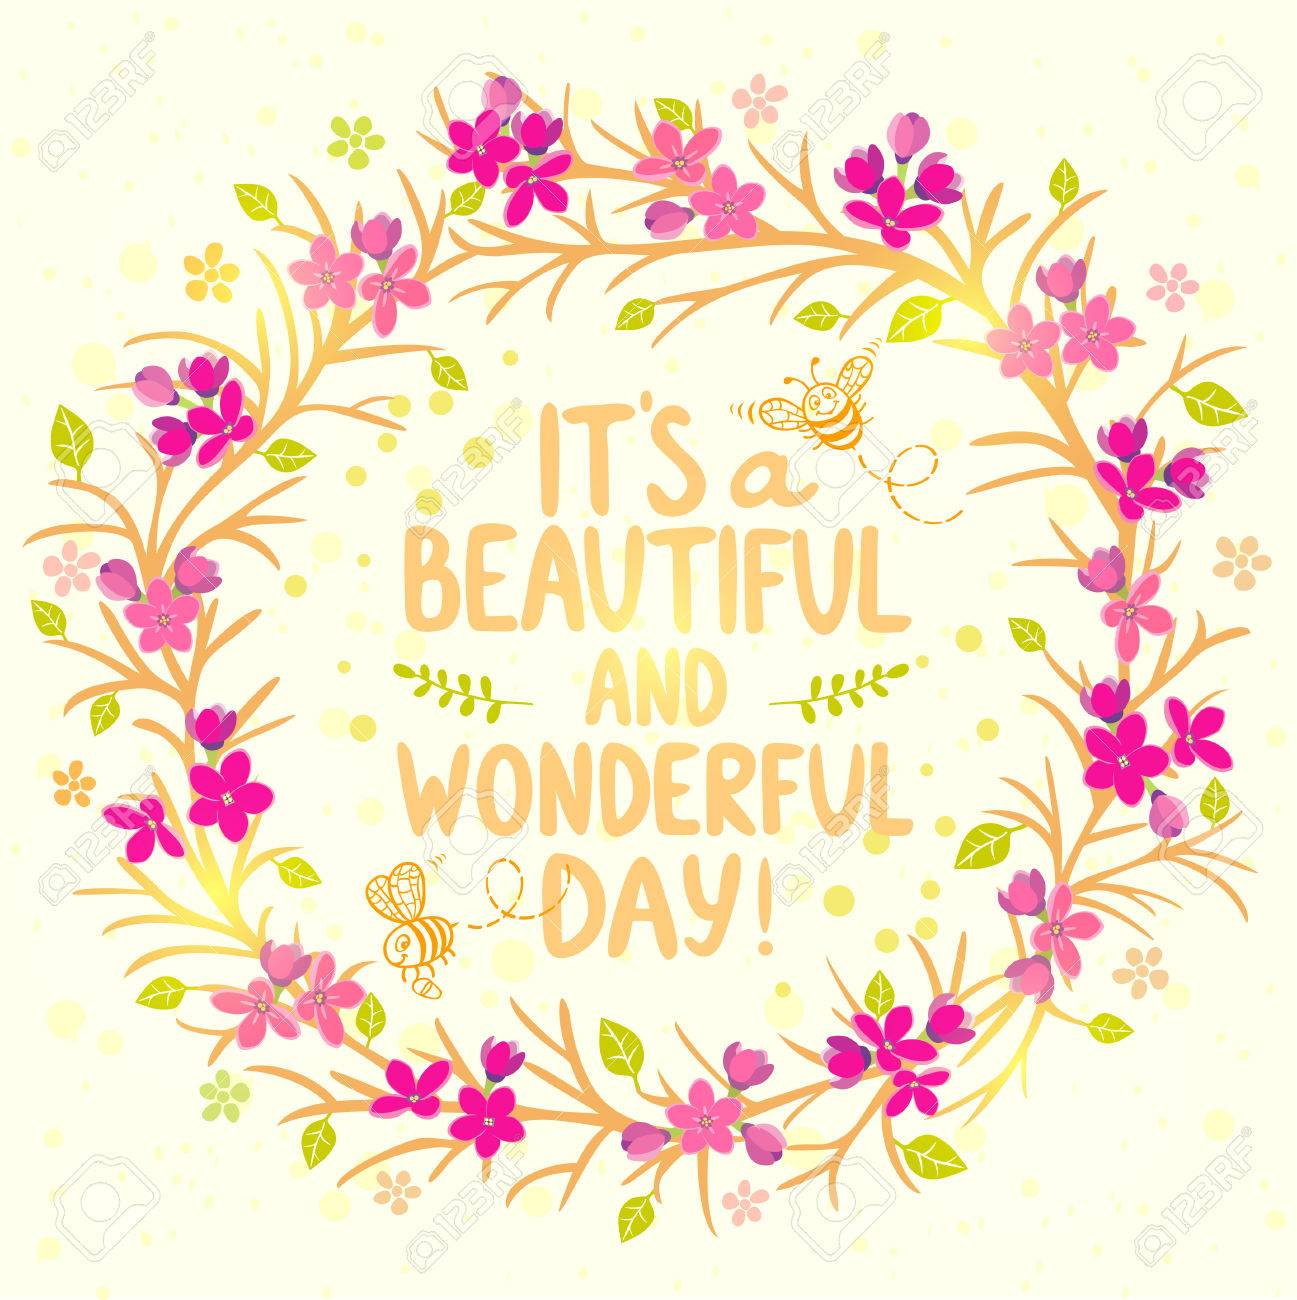 Stylish Beautiful Card Wreath Flowers With Cute Cartoon Bees